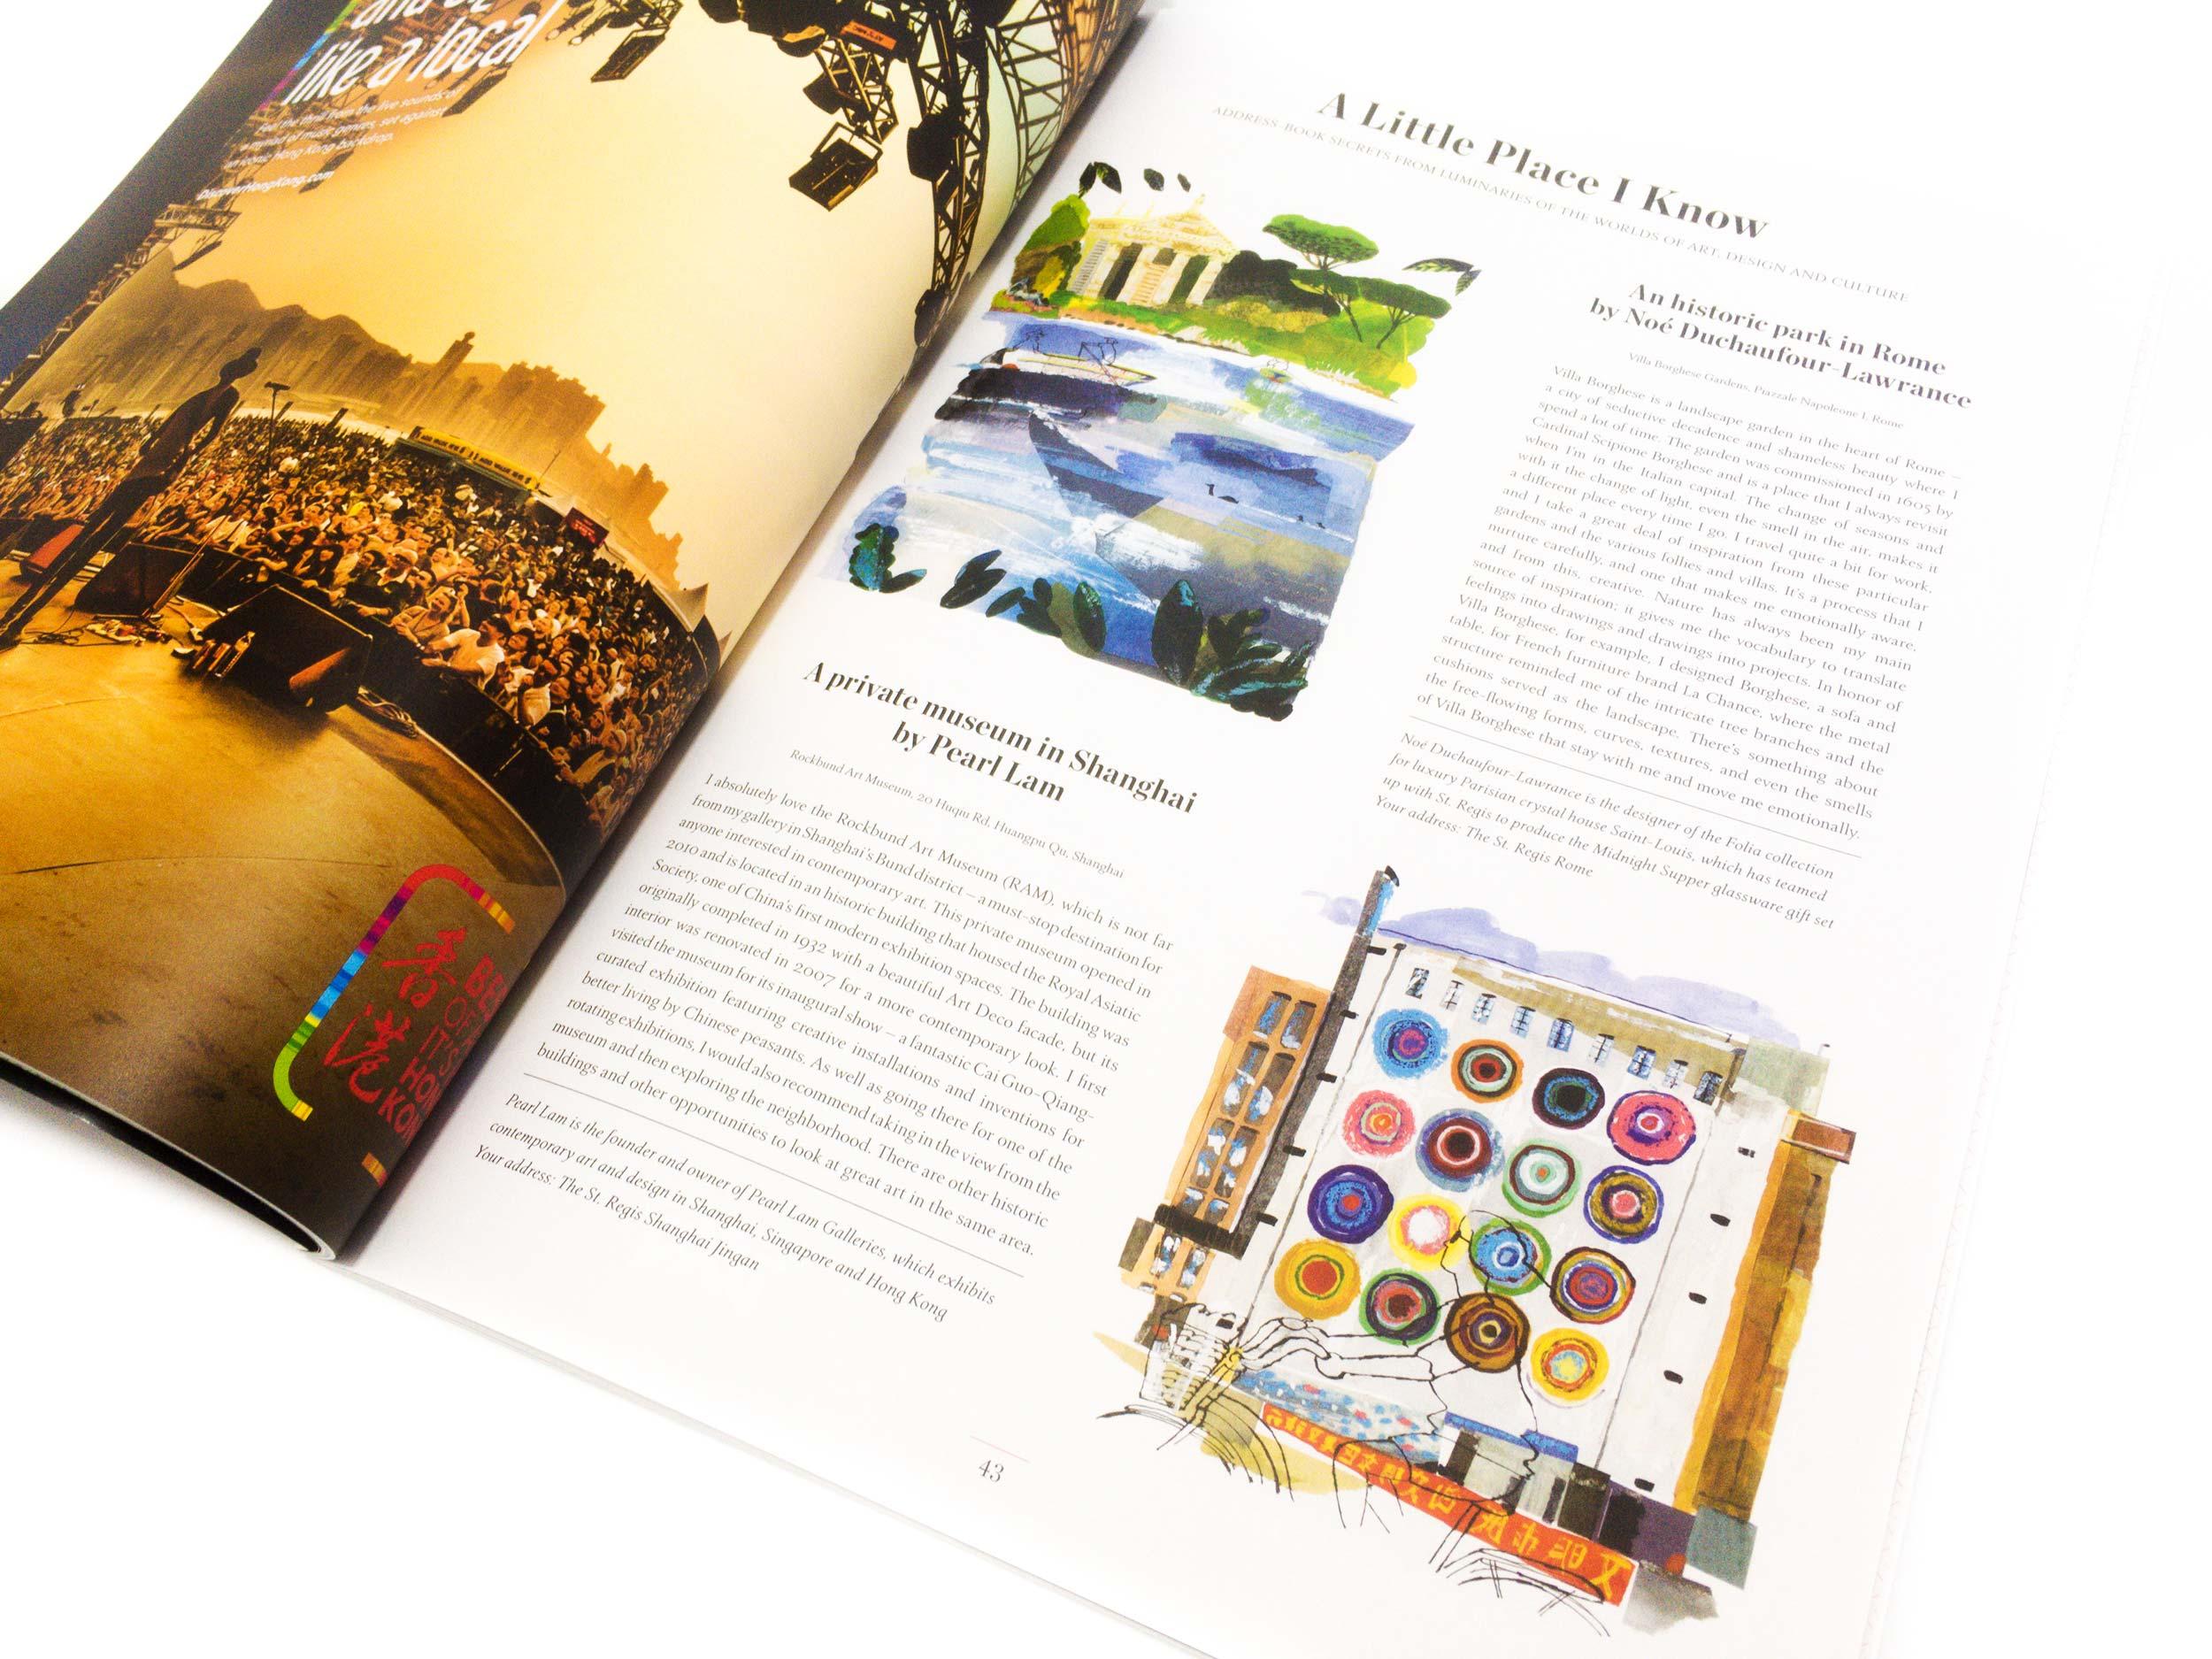 St Regis Beyond illustrations by James Oses, image 1